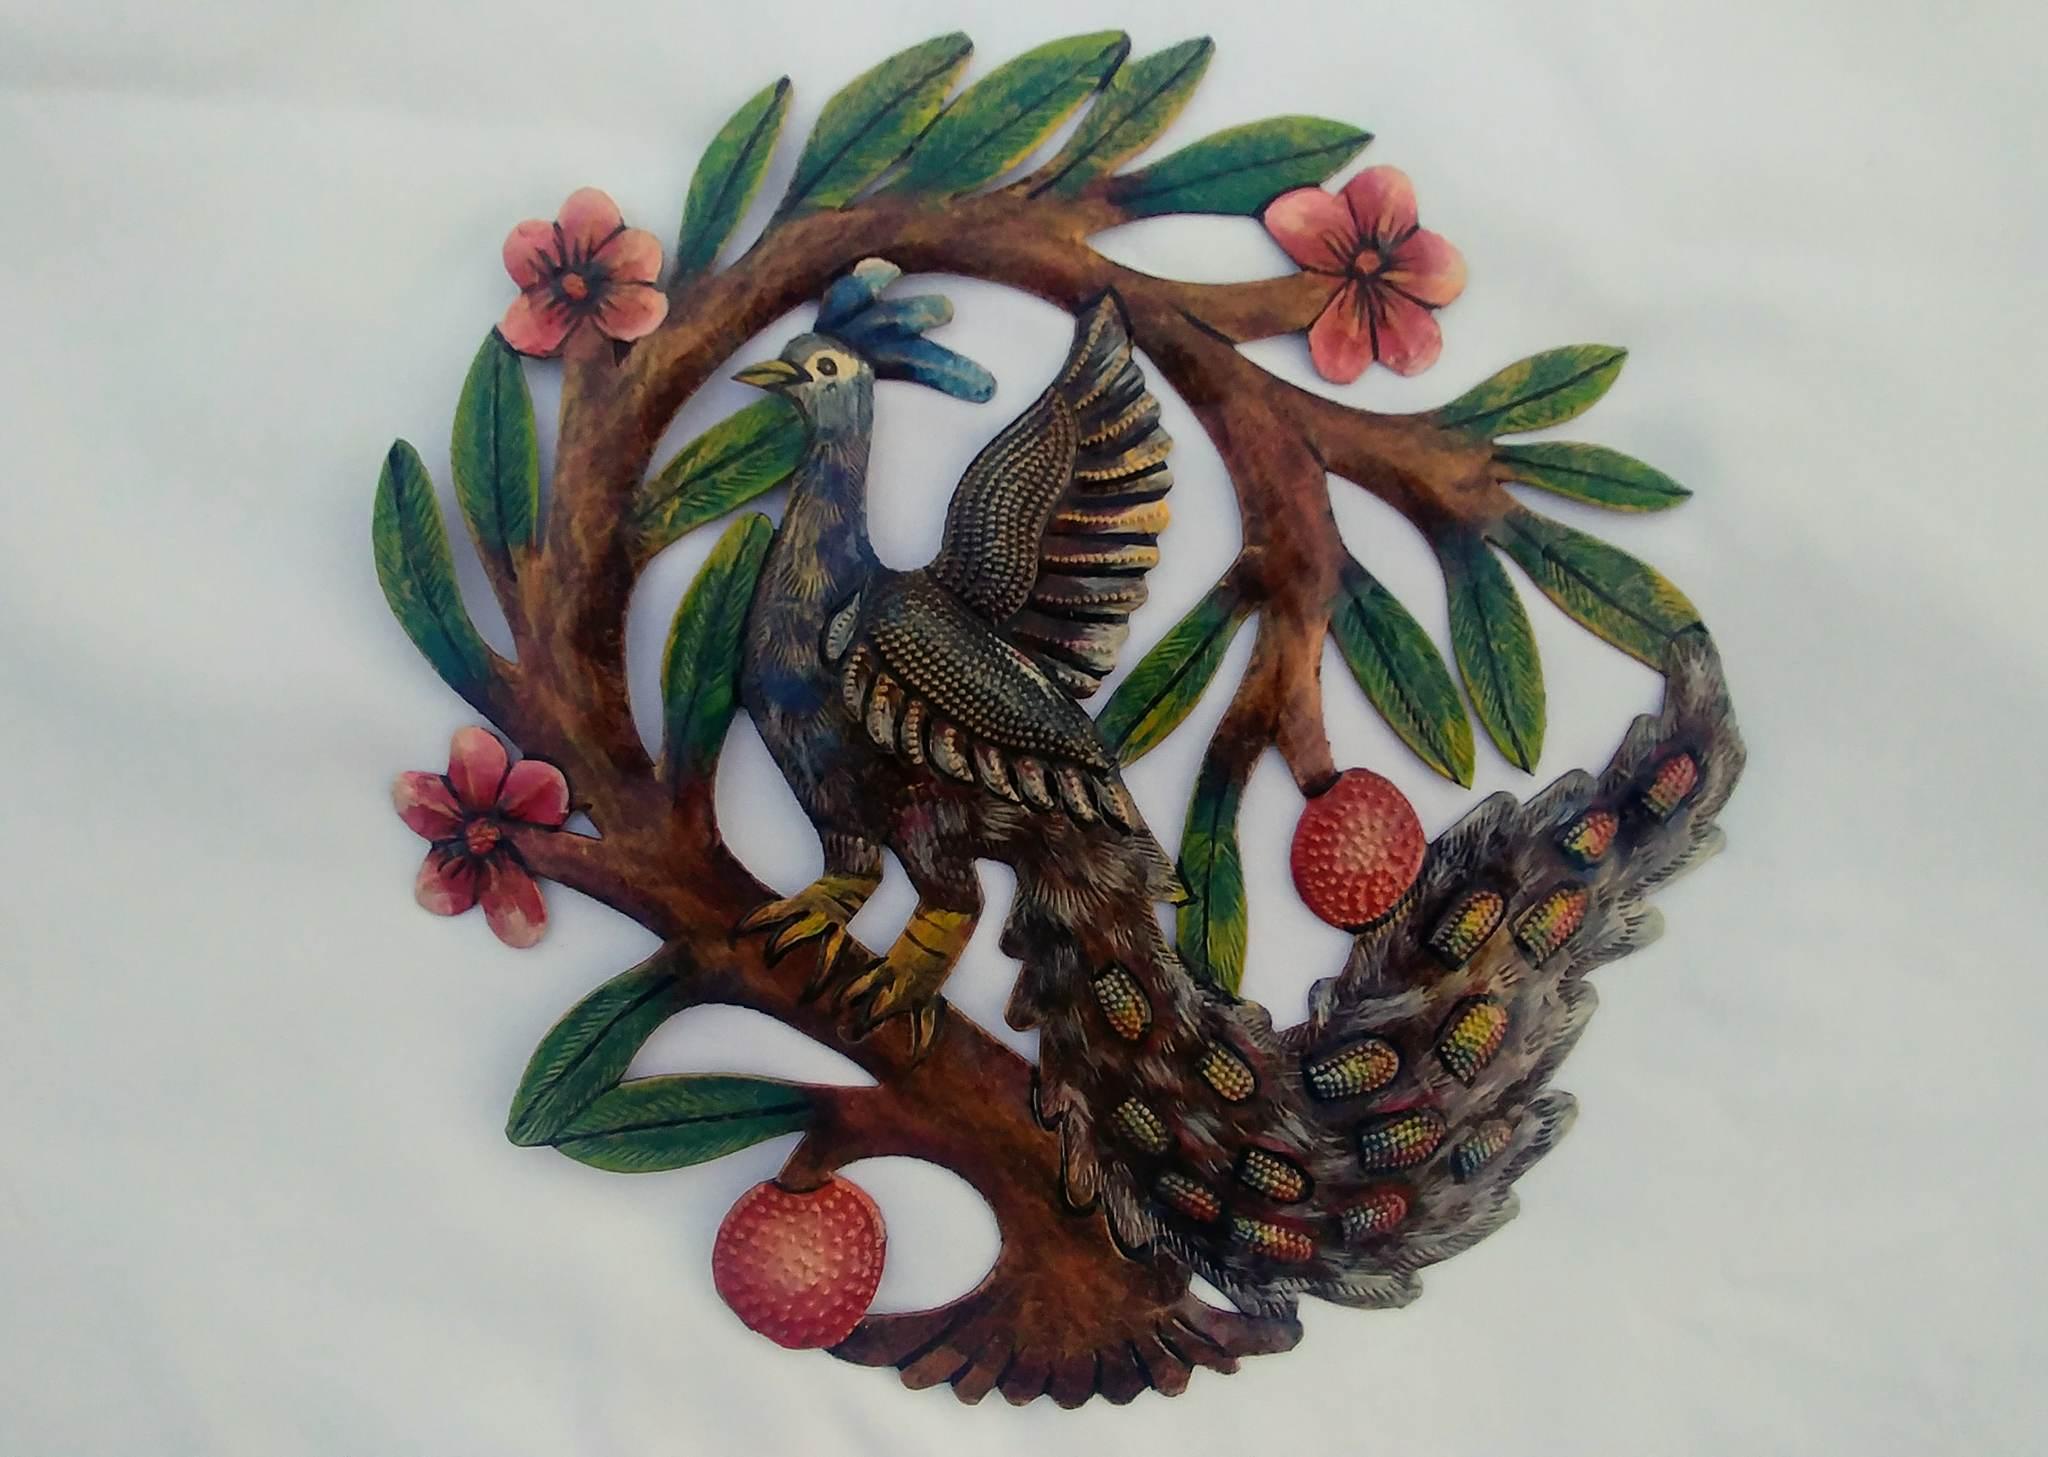 Peacock - $40 - qty 1